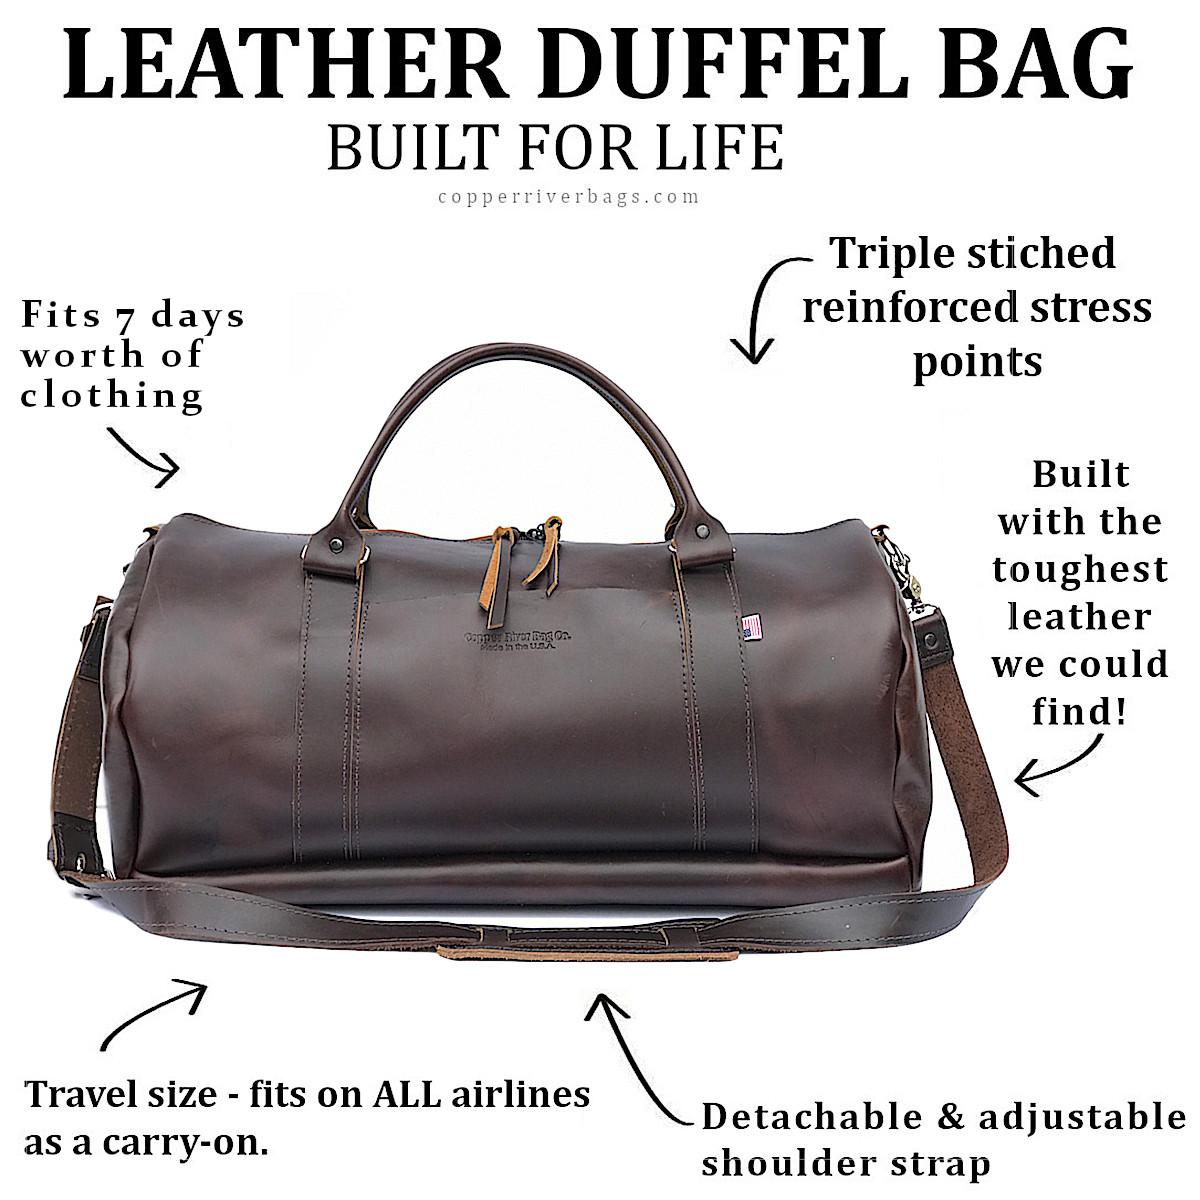 copper-river-duffel-bag-google-disply-ad-logo-1200-x-1200-08976954.jpg